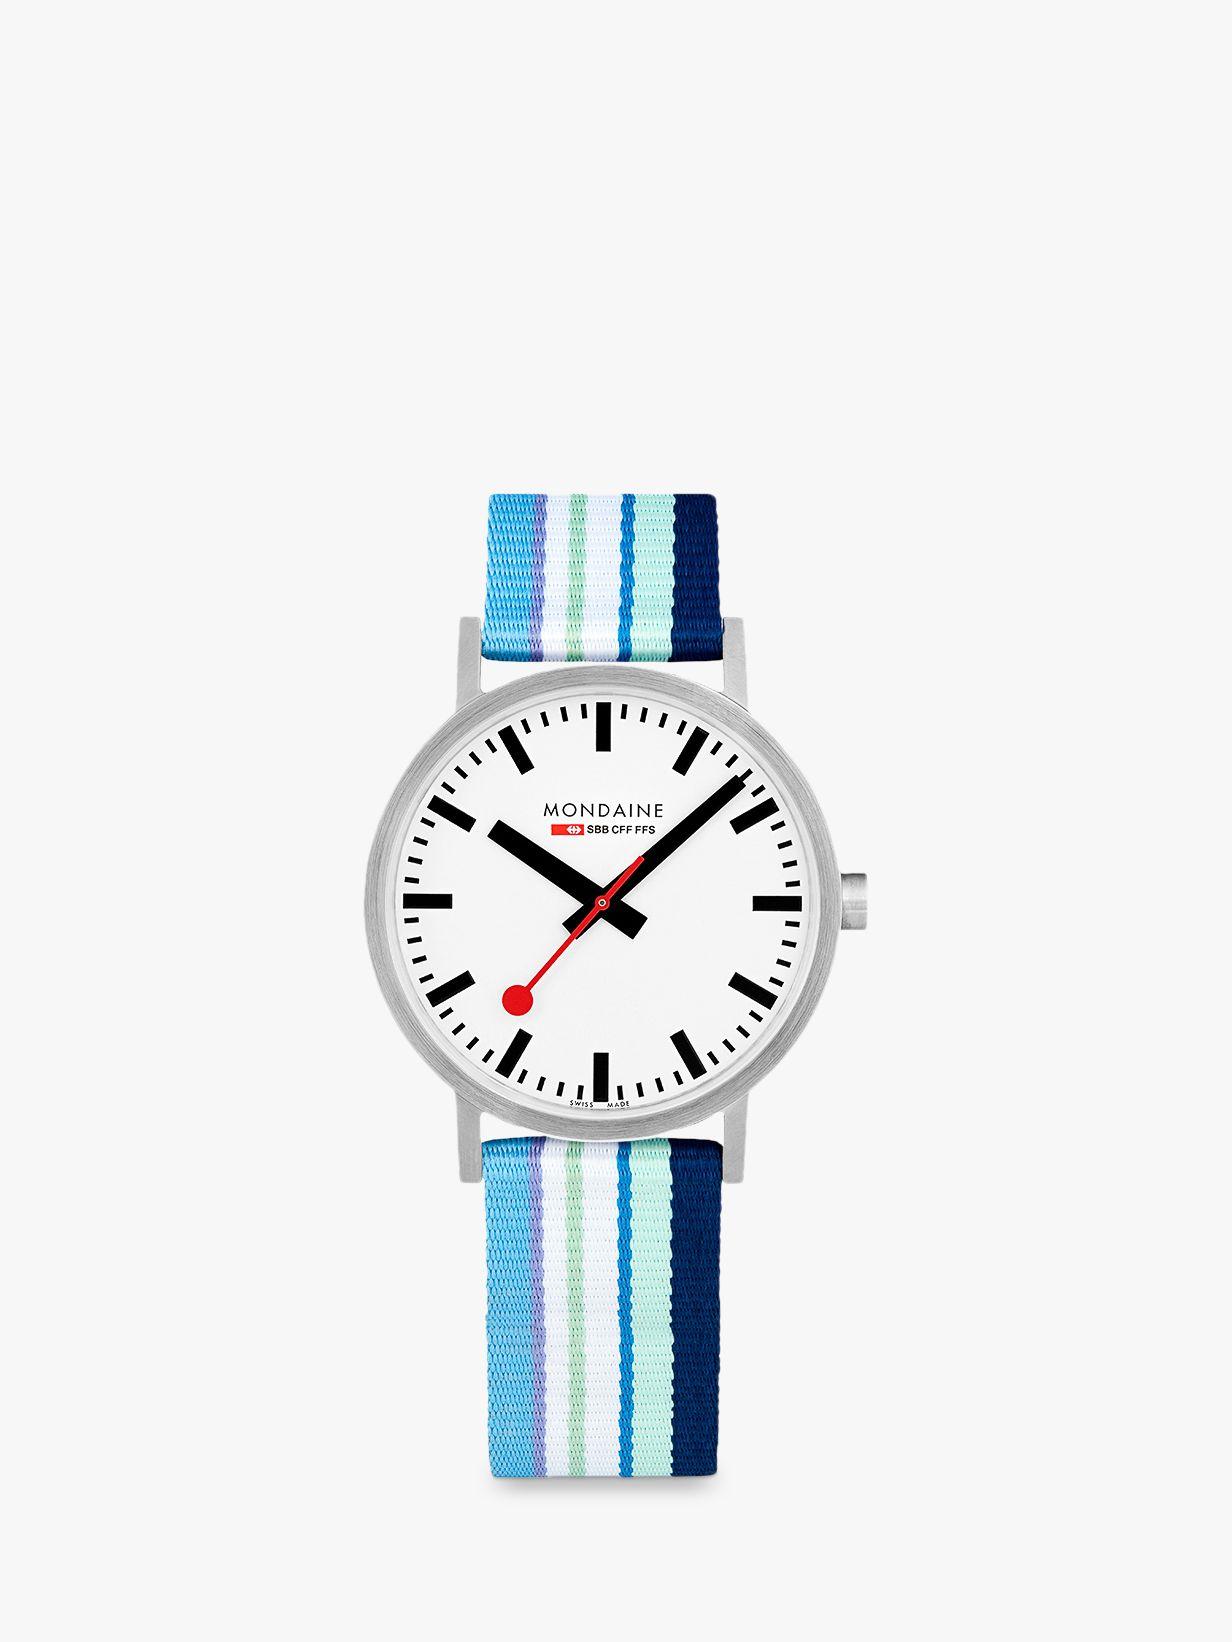 Mondaine Mondaine A660.30360.16SBP Unisex SBB Classic Fabric Strap Watch, Blue Multi/White